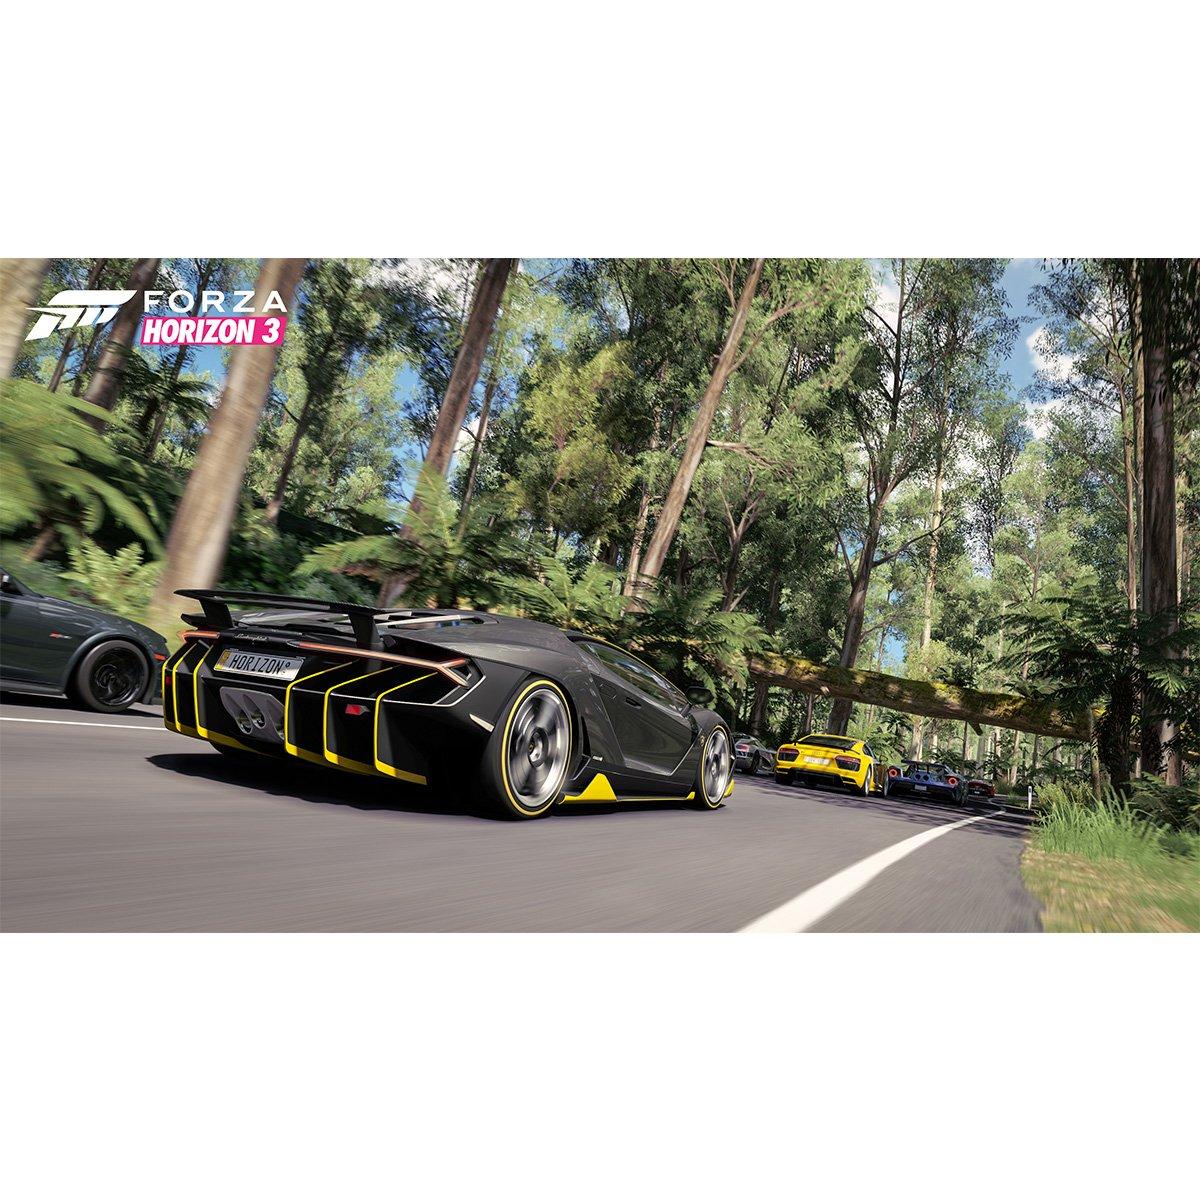 Forza Horizon 3 - Xbox One by Microsoft (Image #4)